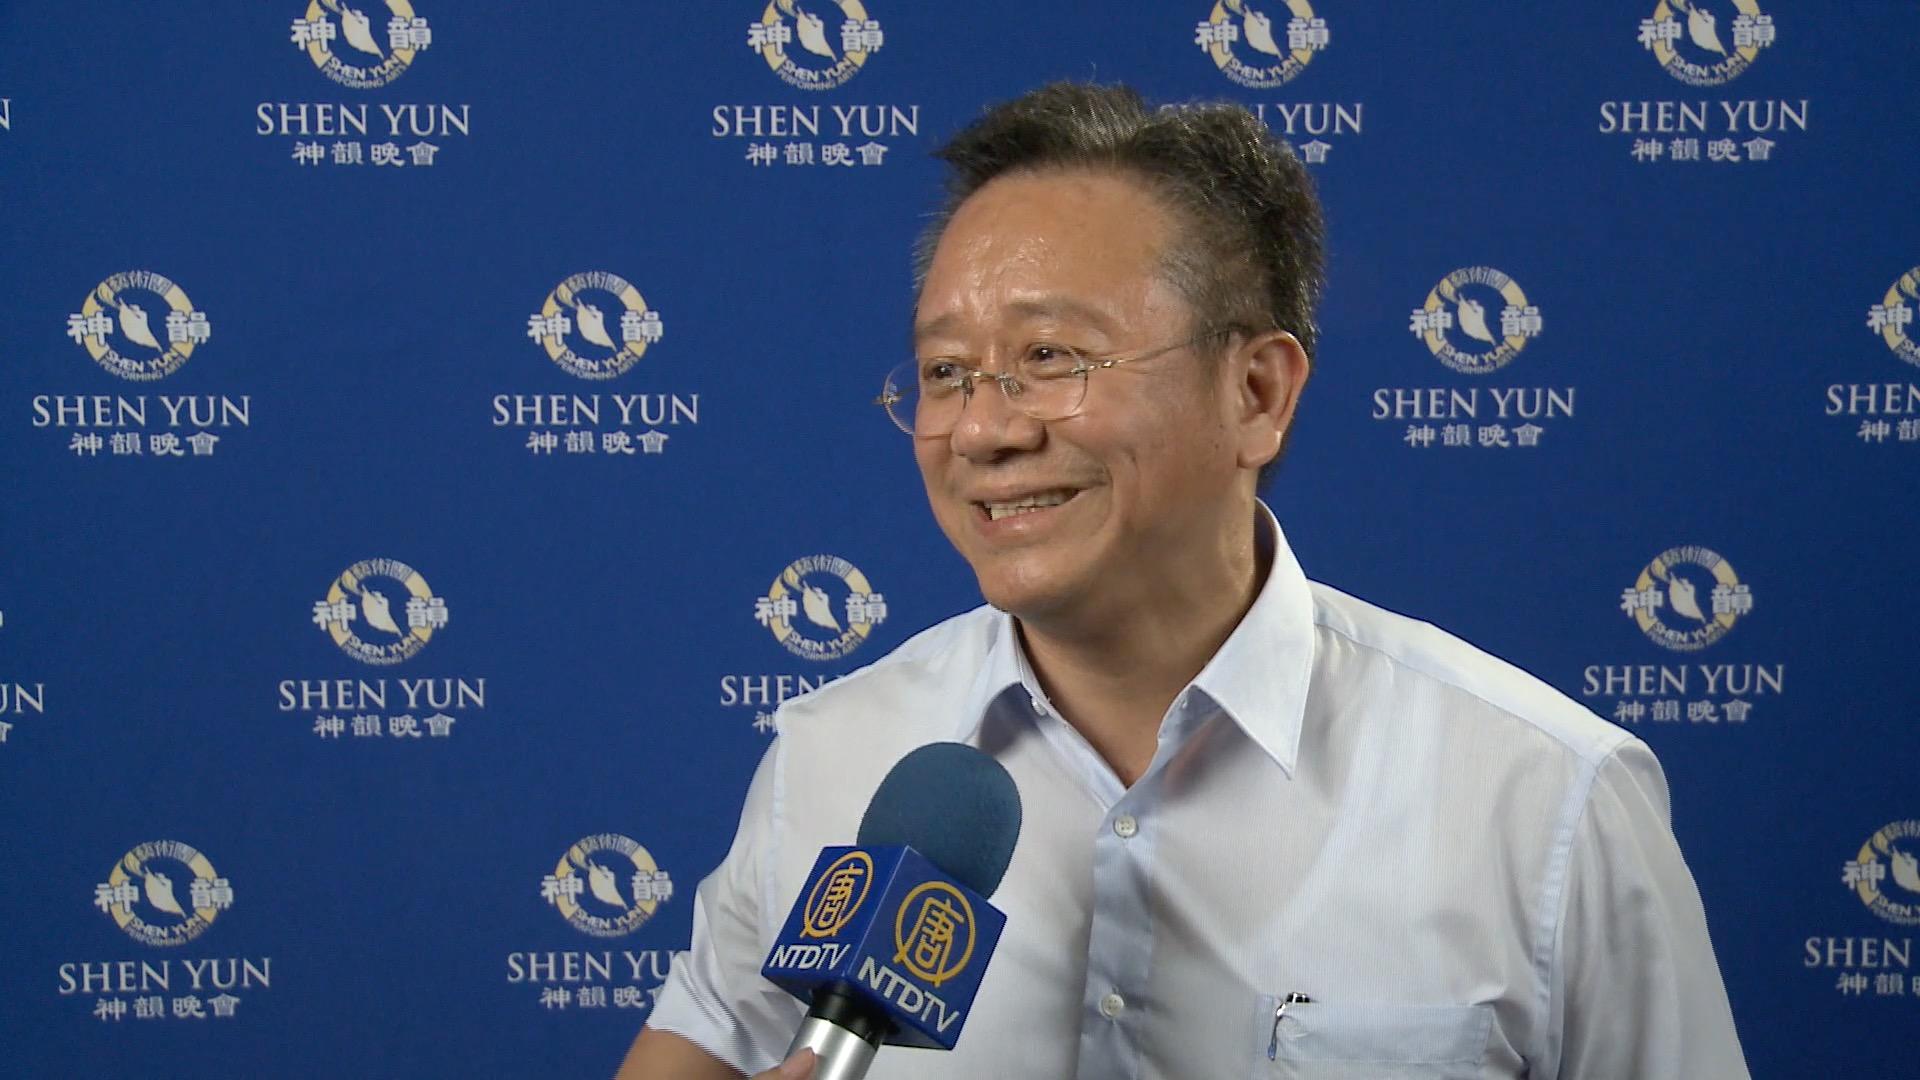 Shen Yun Symphony Orchestra Popular in Chiayi, Taiwan's Woodwind Music Capital